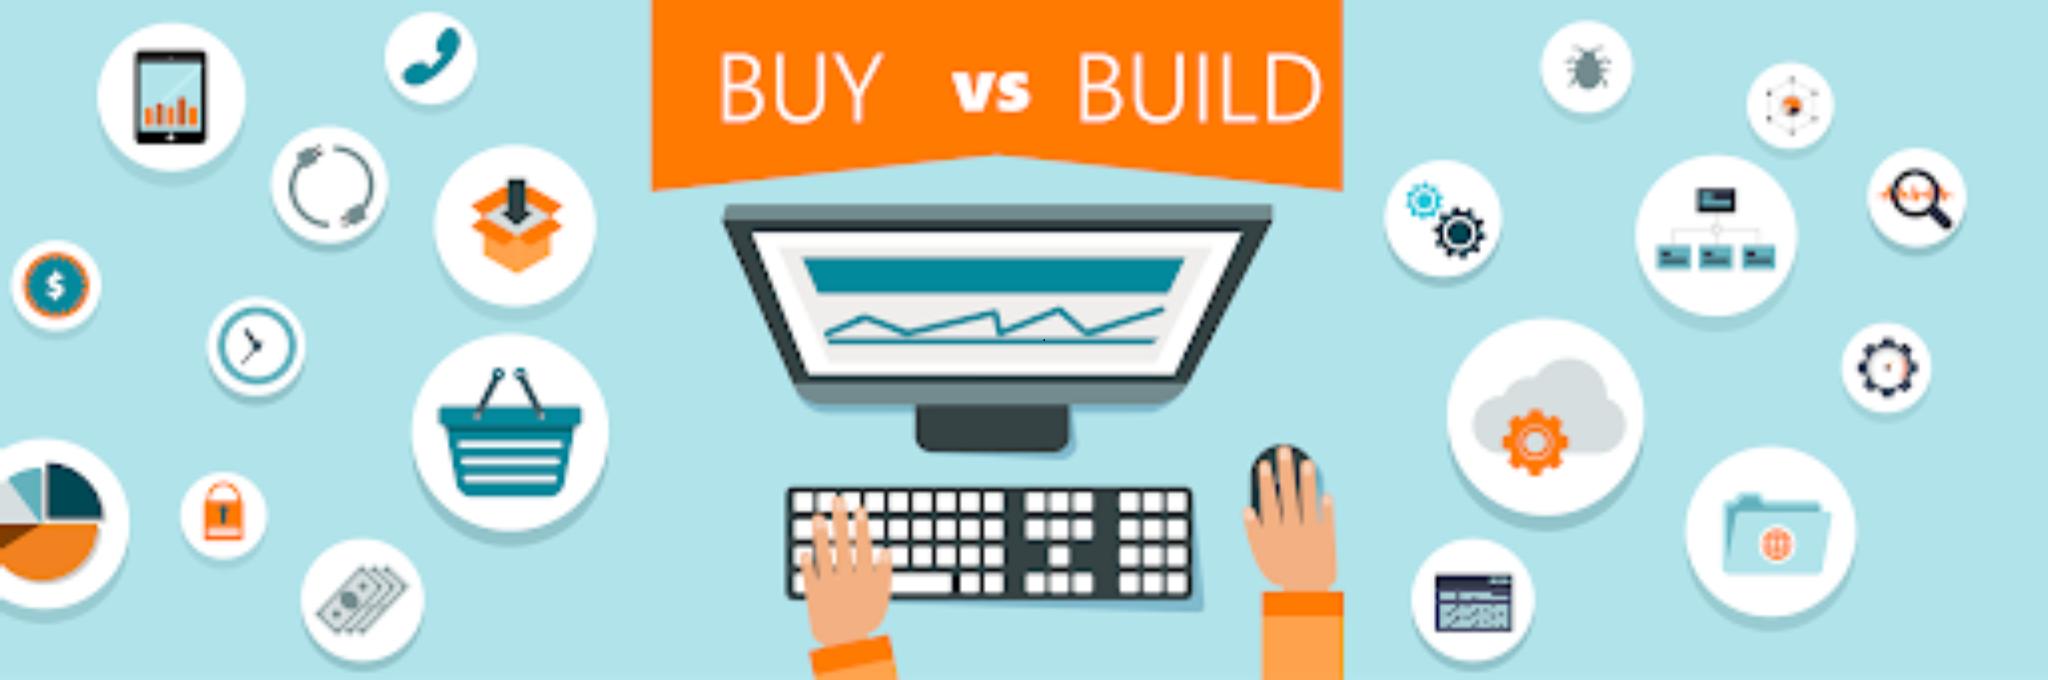 Data Pipeline: The Dilemma of Build vs Buy | Hevo Data